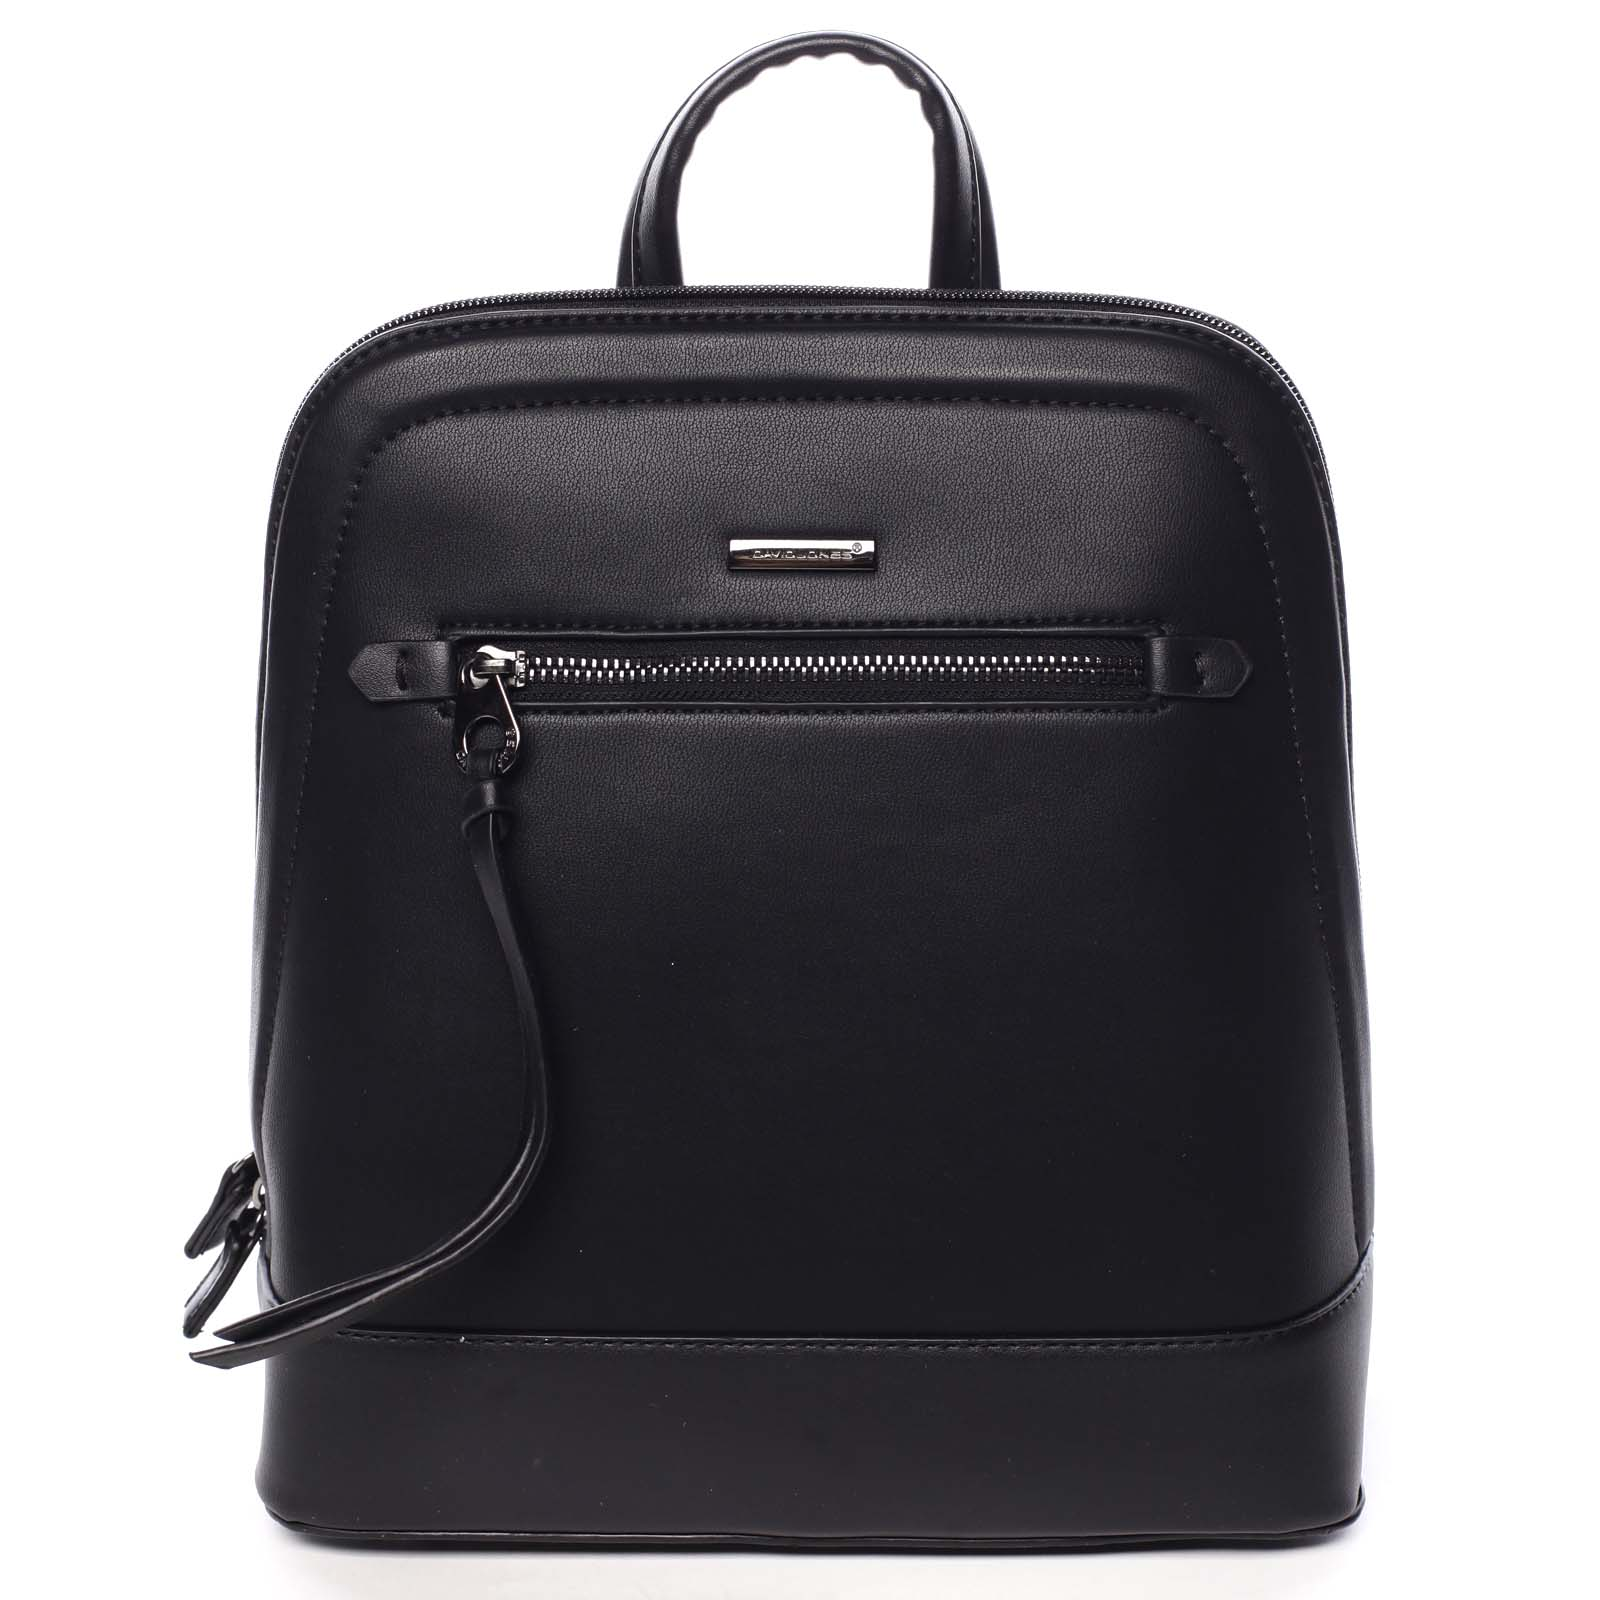 Dámský batoh černý - David Jones Joli